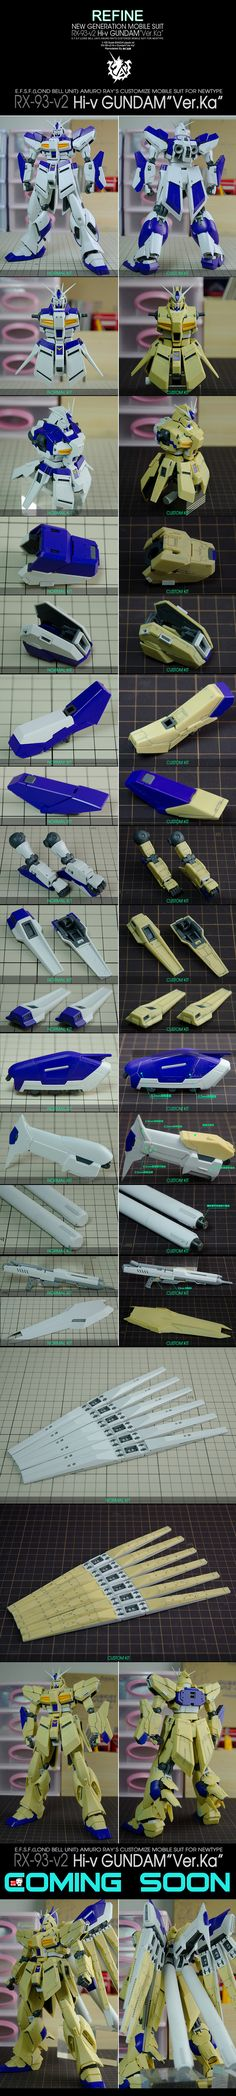 [MG Hi Nu Gundam Ver.Ka Remodeling] REFINE RX-93-v2 Hi Nu Gundam Ver.TF: Work by toufu. Full Photoreview A LOT of HD Images, WIP too http://www.gunjap.net/site/?p=239099